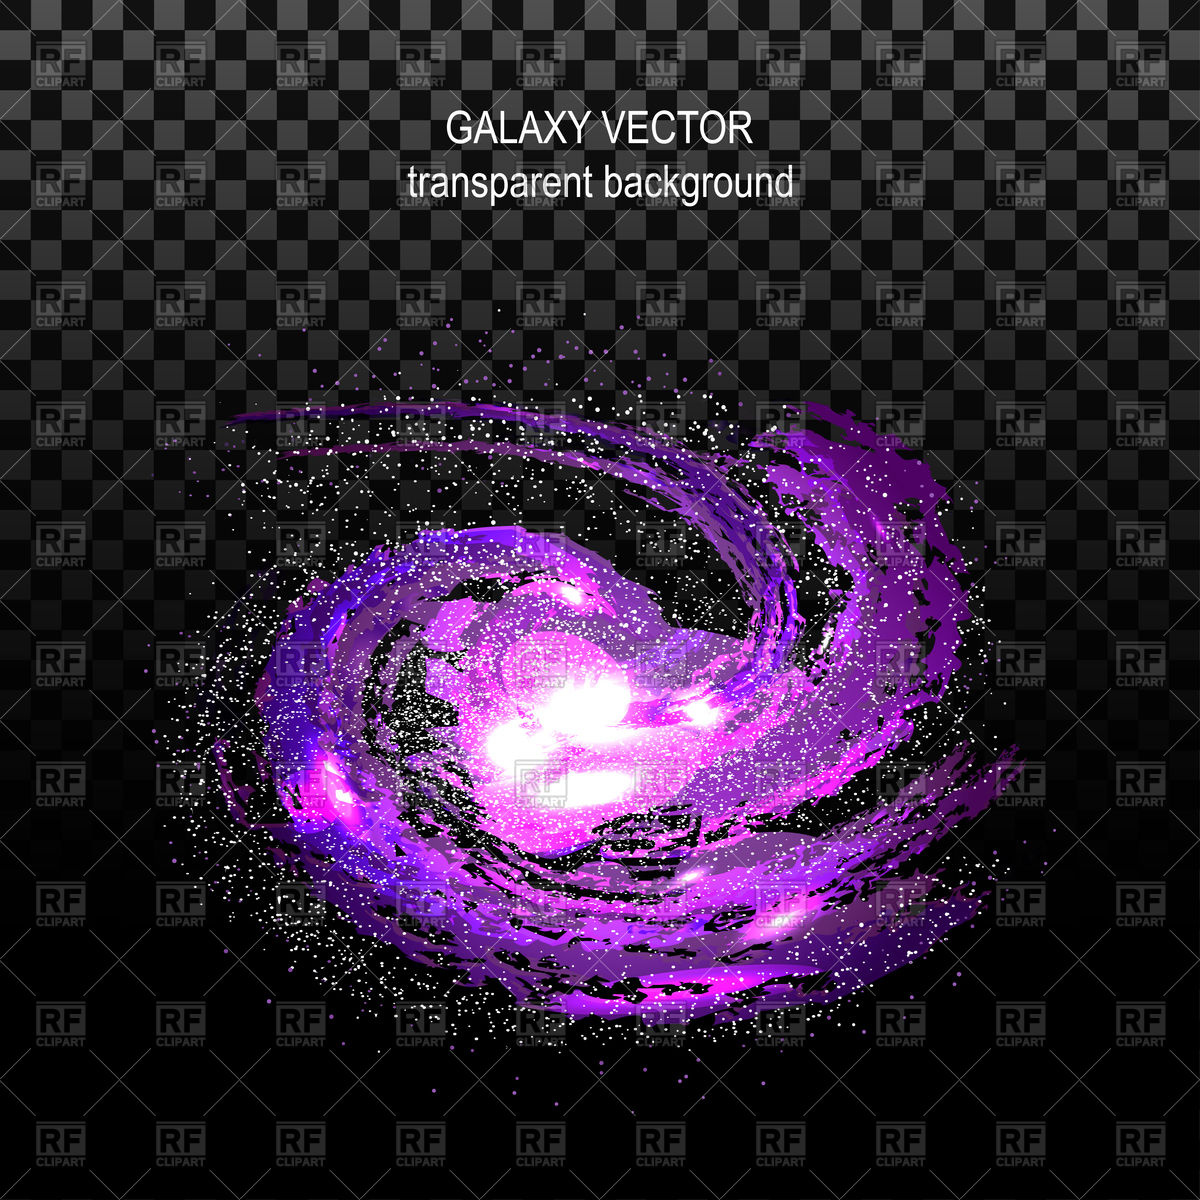 1200x1200 Violet Spiral Galaxy On Transparent Black Background Vector Image